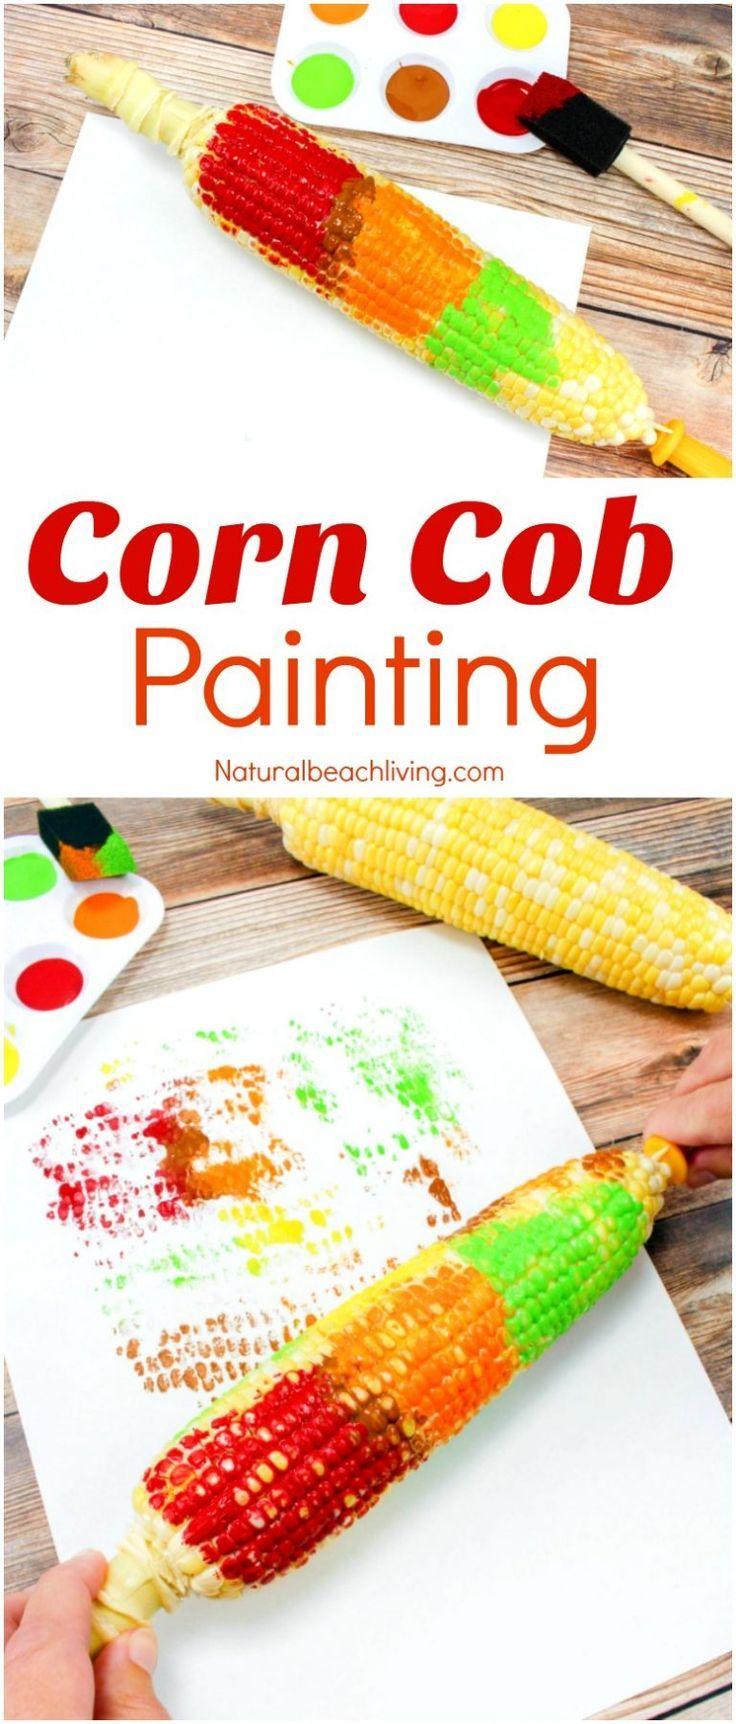 Easy Corn Cob Craft Painting for Kids - Corn Craft Ideas - Natural Beach Living #fallactivitiesforkids